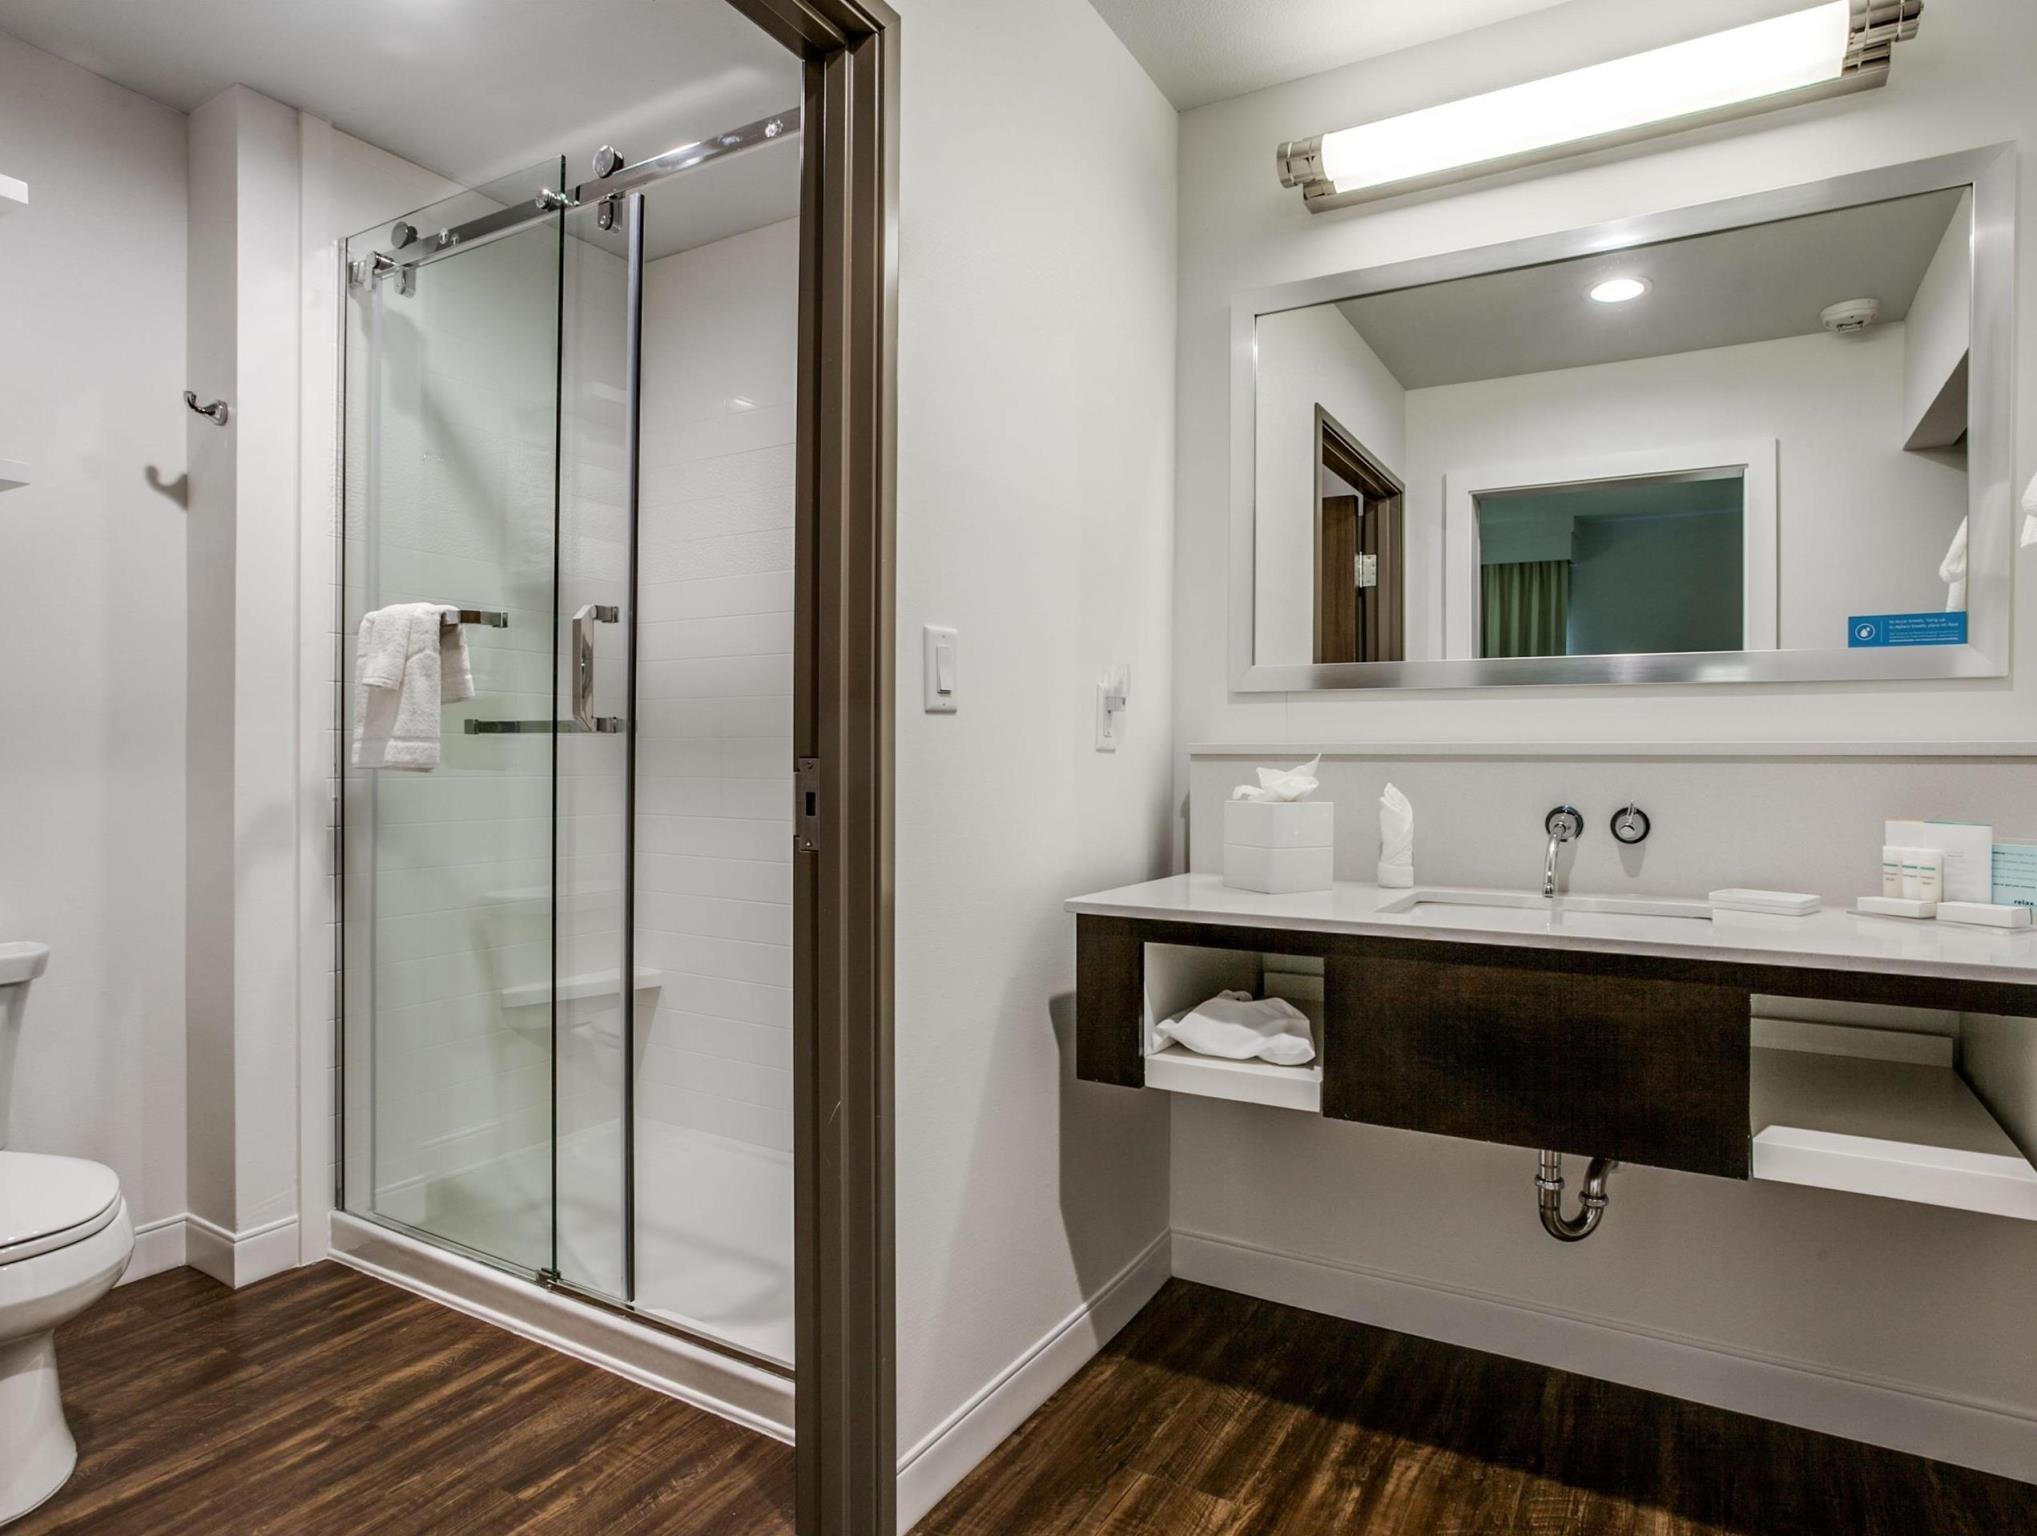 Hampton Inn & Suites Dallas Central Expy North Park Area